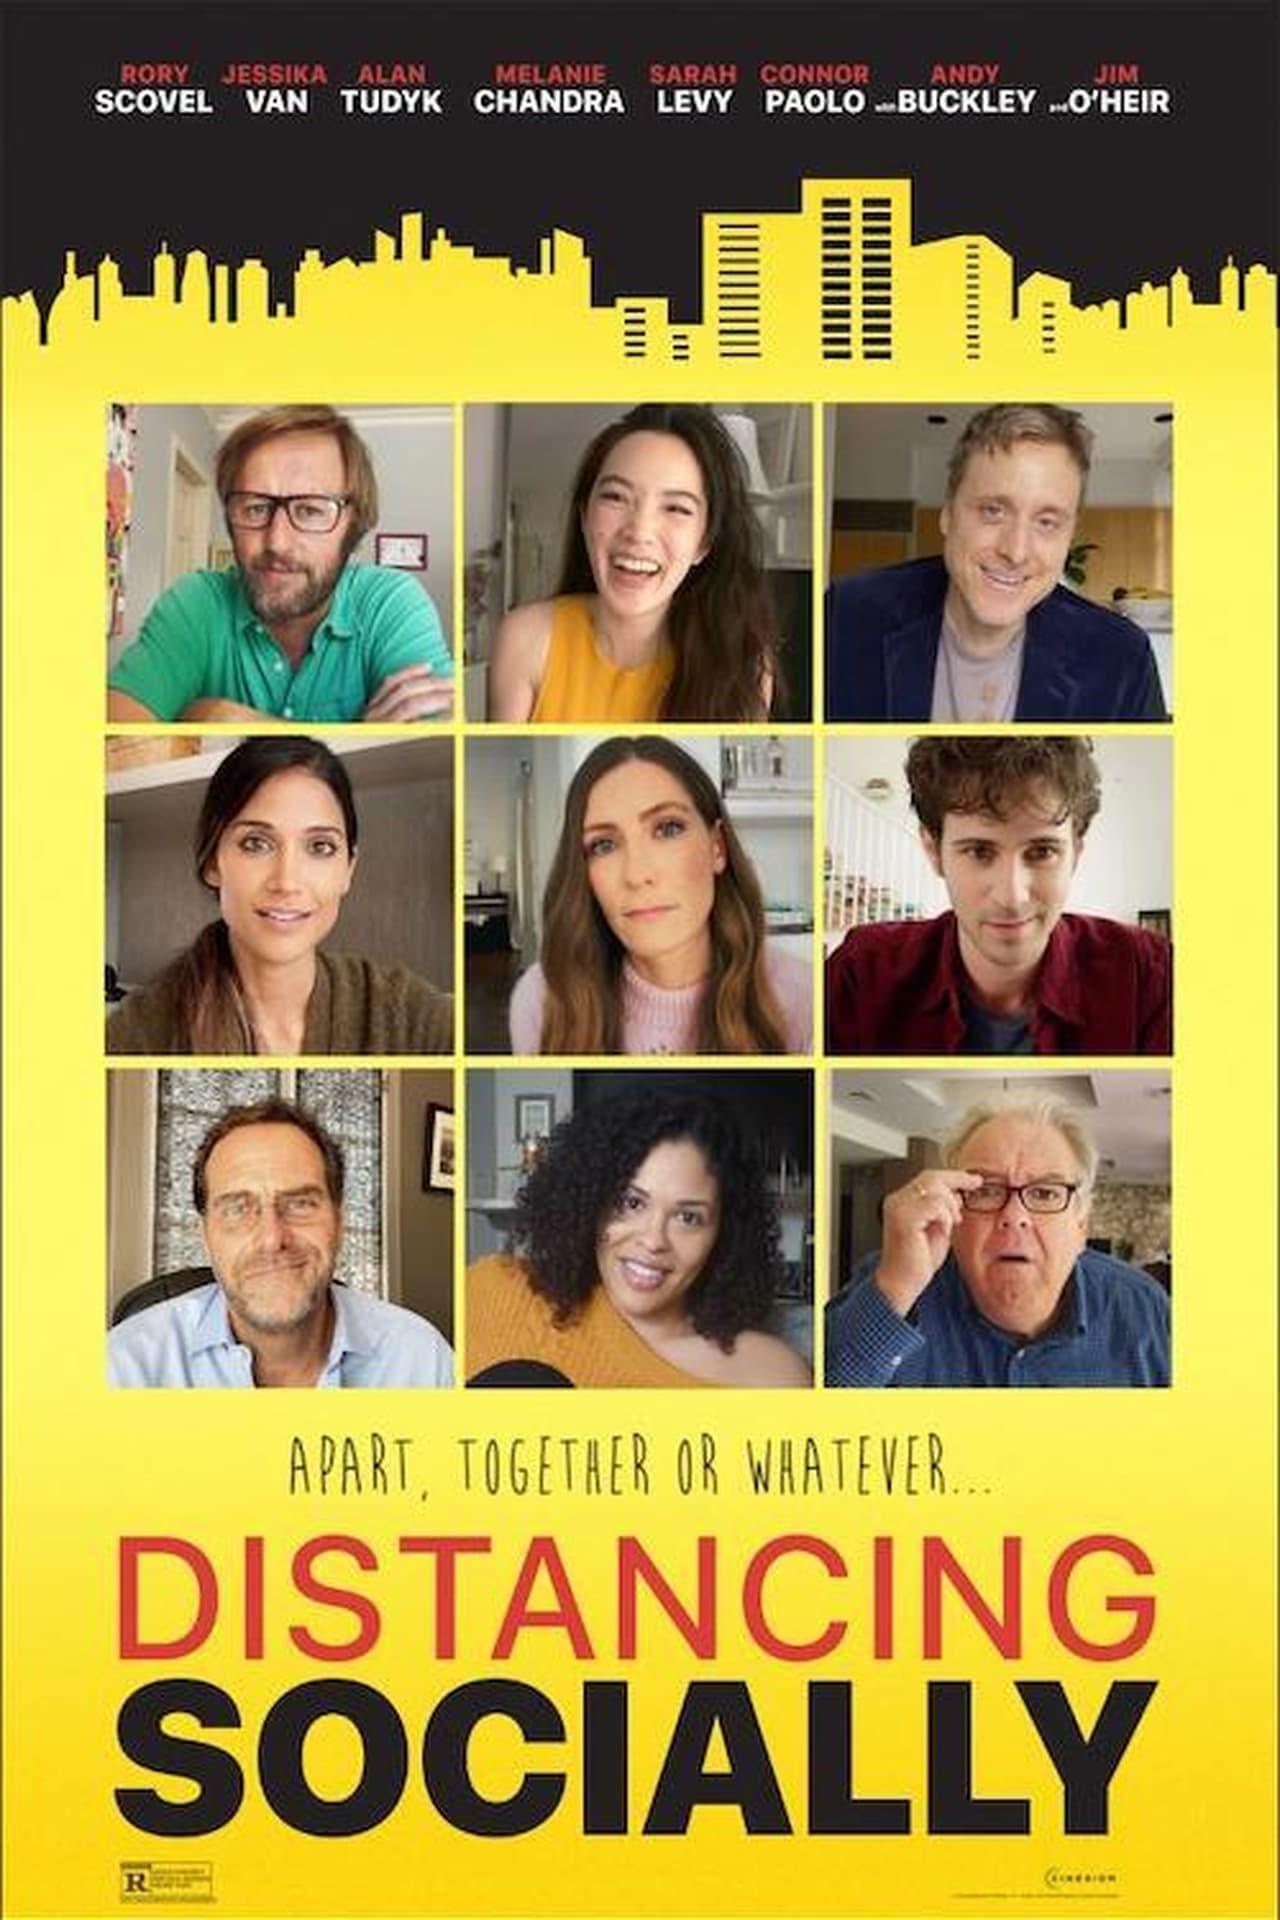 Distancing Socially